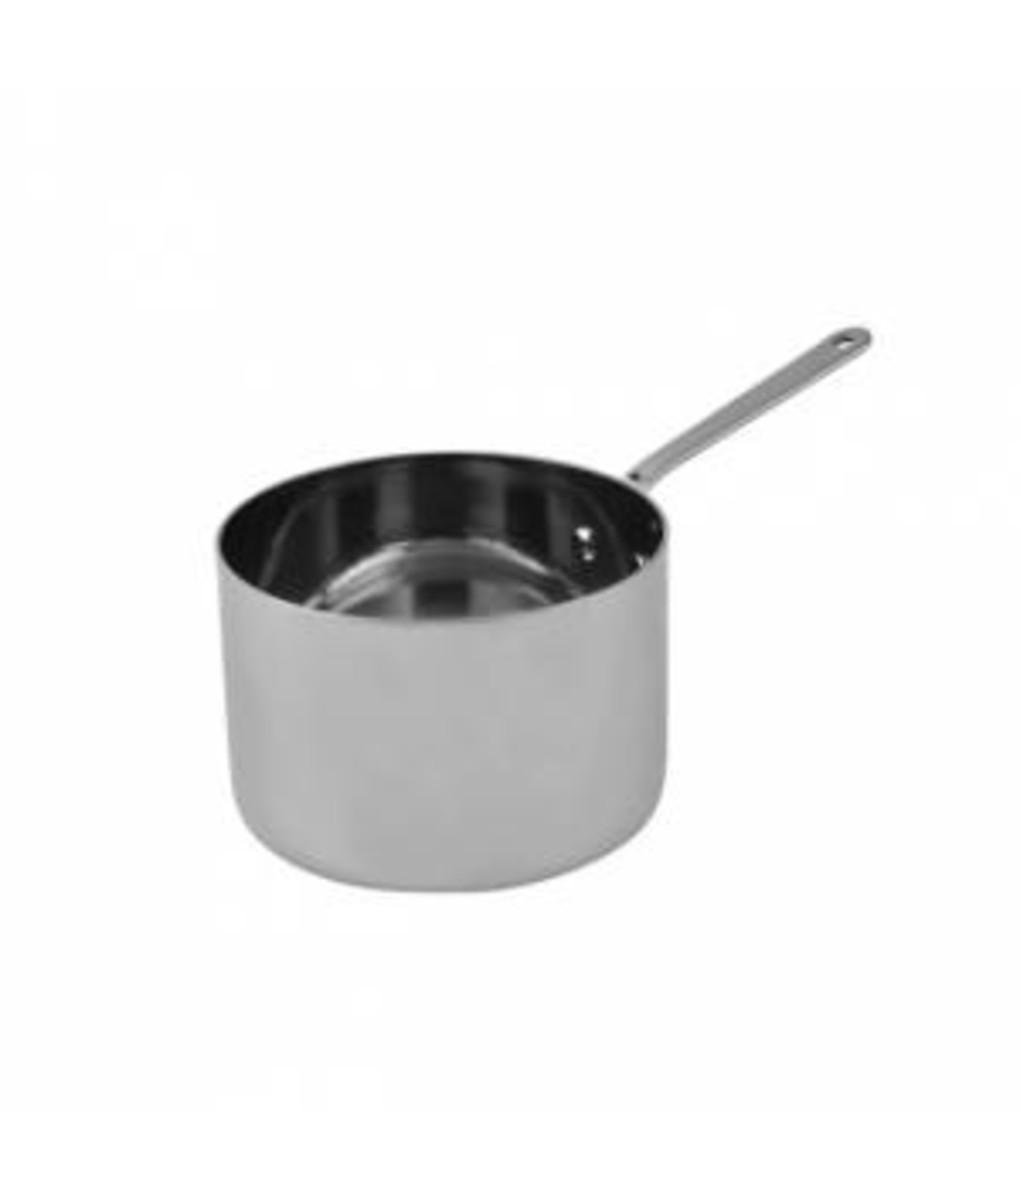 Mini Saucepan - Round Stainless Steel 90x60mm by Soho